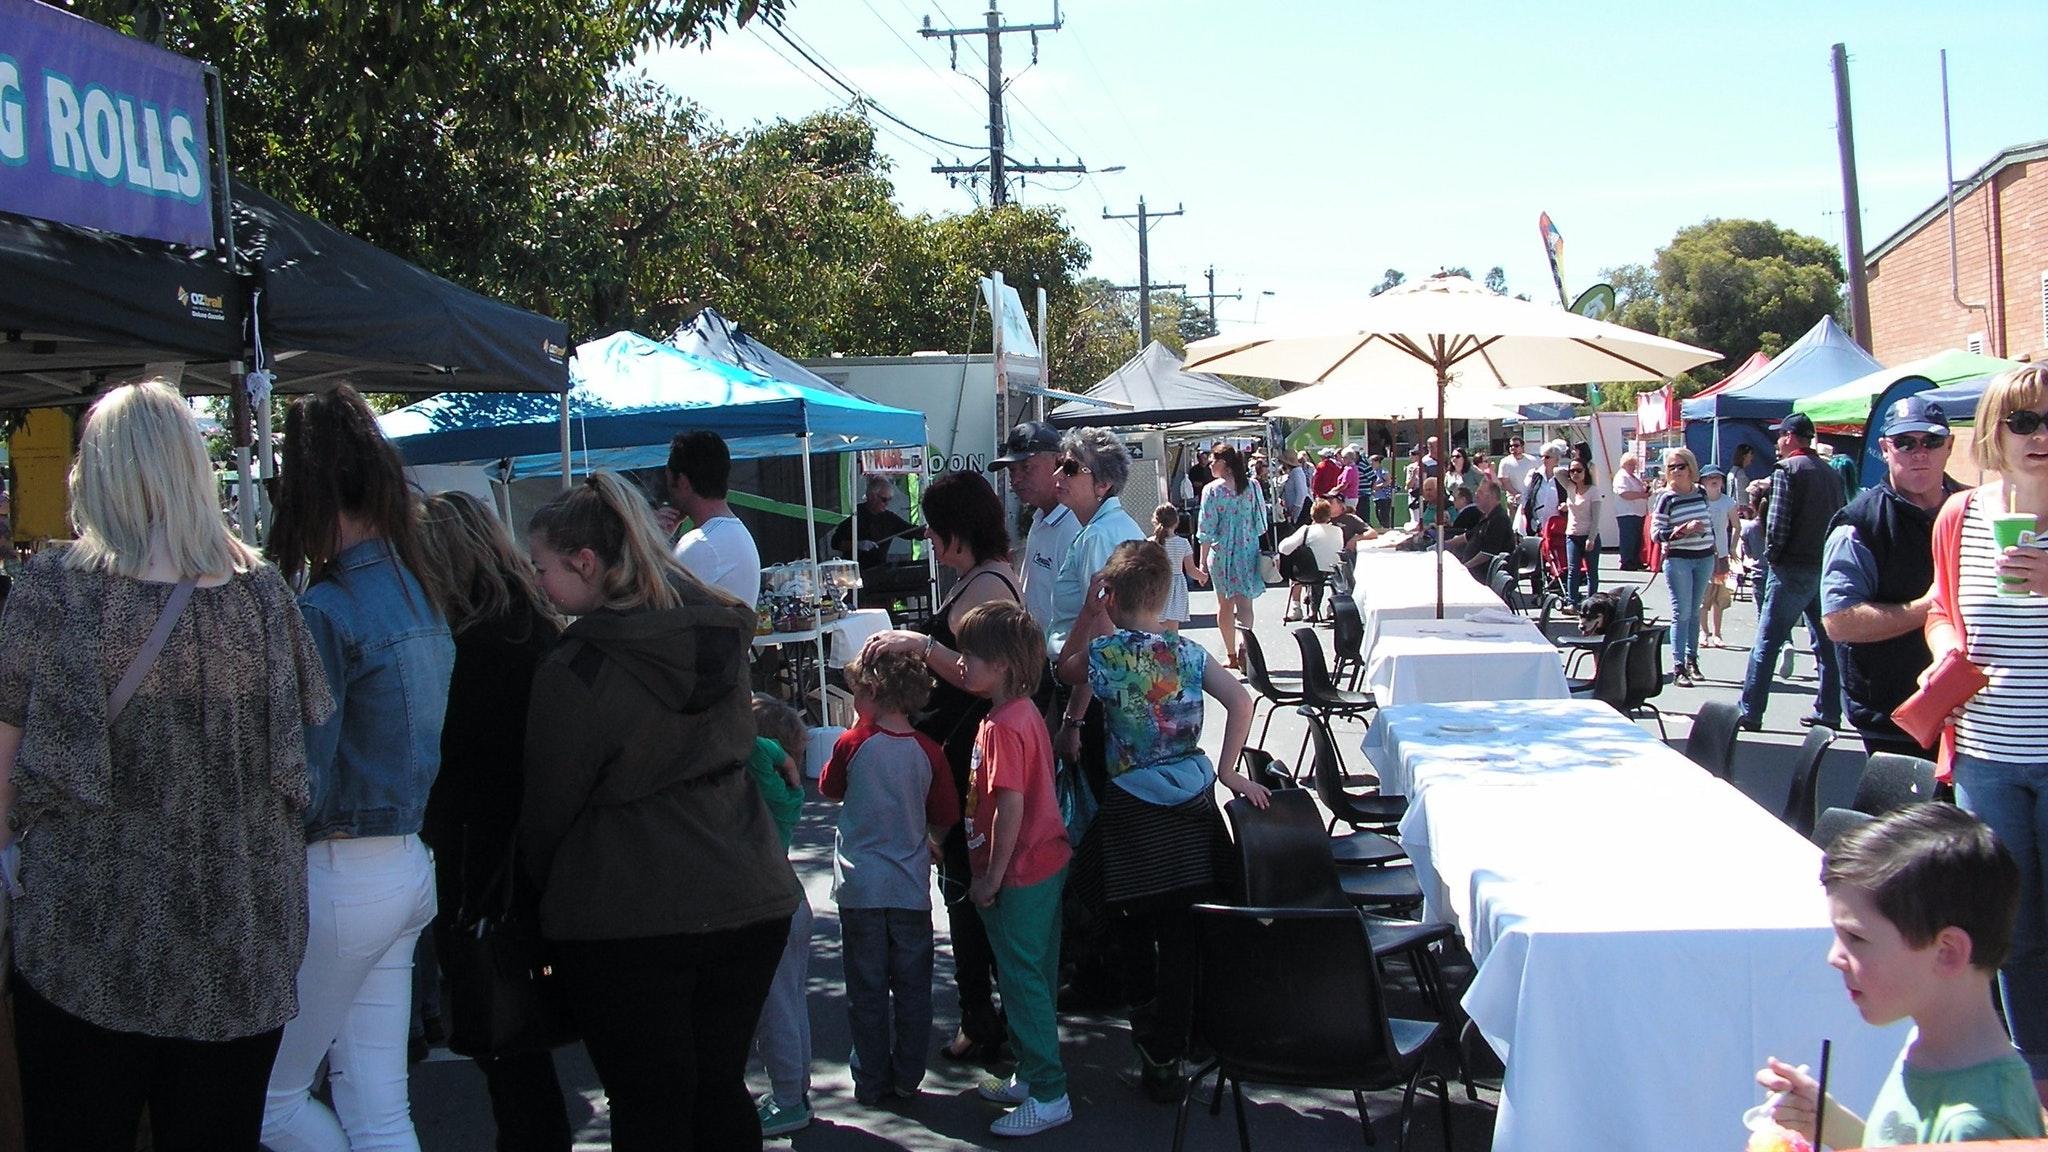 Numurkah Foodbowl Festival